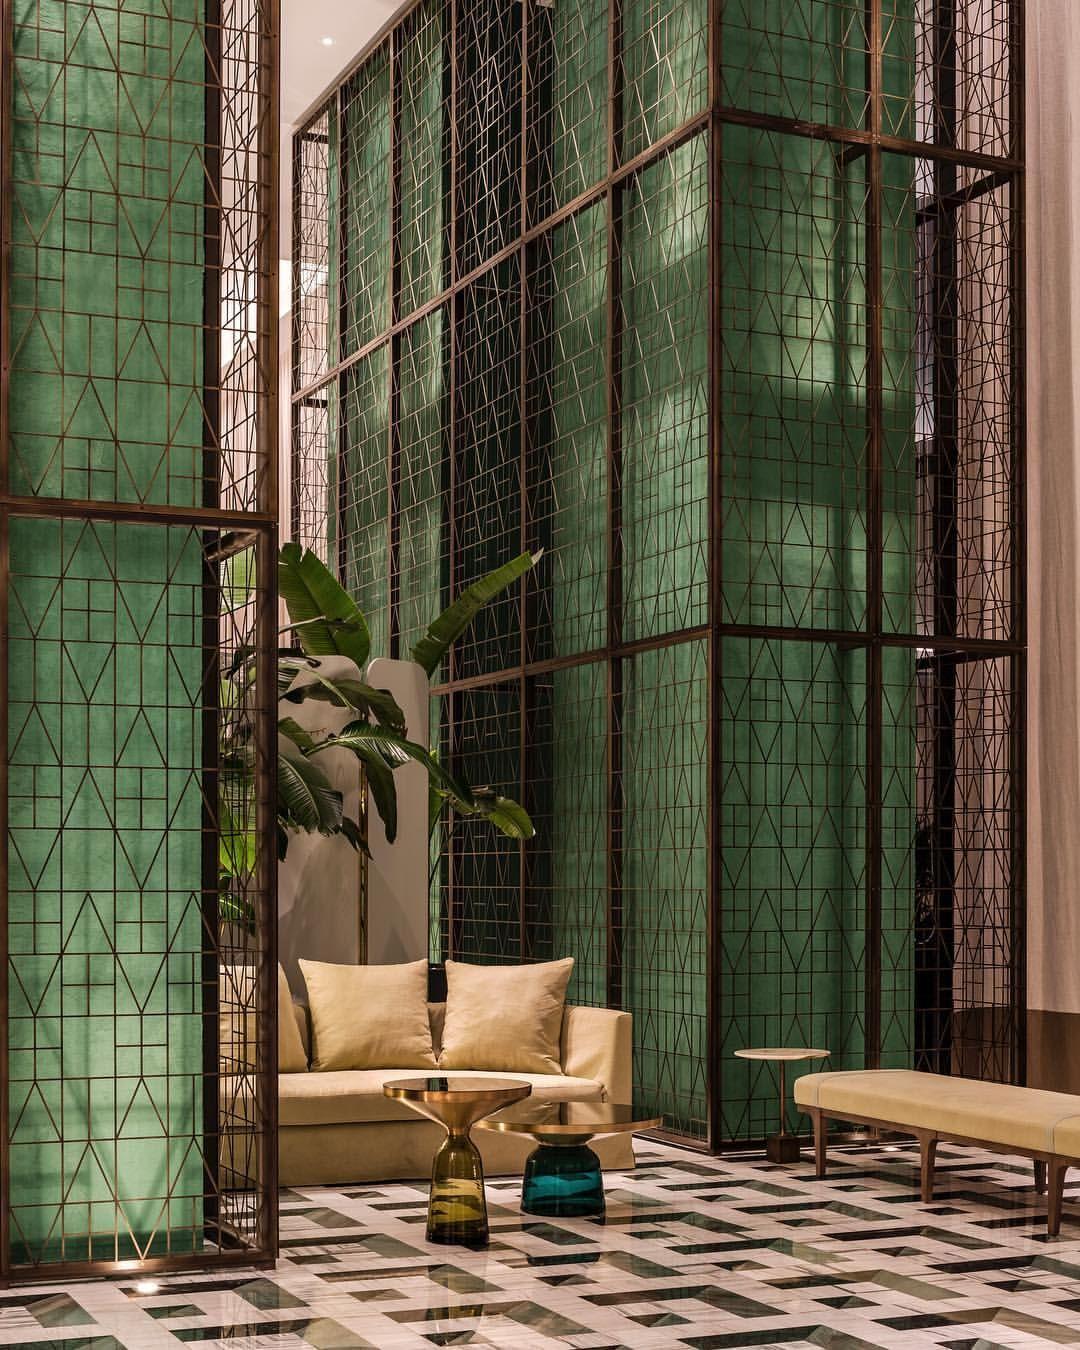 "KRIS TAMBURELLO on Instagram ""SLS LUX   Designed By YabuPushelberg   Miami   2019 @yabupushelberg @katsuyabrickell @slsluxbrickell • • • miami interiordesign…"" is part of Lobby interior design - 355 Likes, 9 Comments  KRIS TAMBURELLO (@kris tamburello) on Instagram ""SLS LUX   Designed By YabuPushelberg   Miami   2019 @yabupushelberg @katsuyabrickell…"""